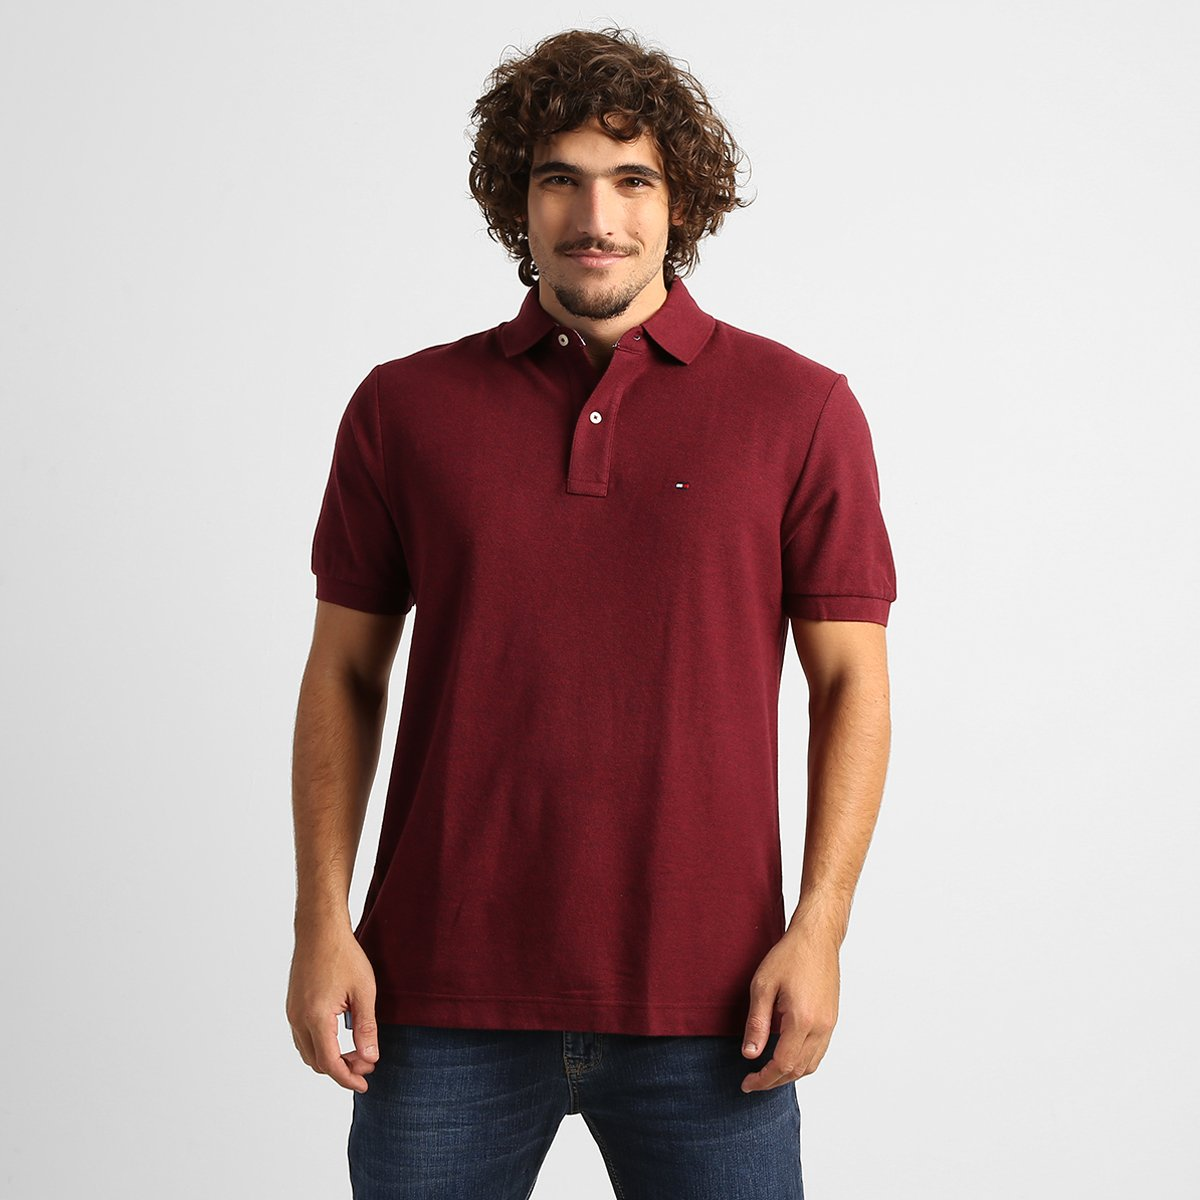 9473e15569 Camisa Polo Tommy Hilfiger Piquet Básica - Compre Agora